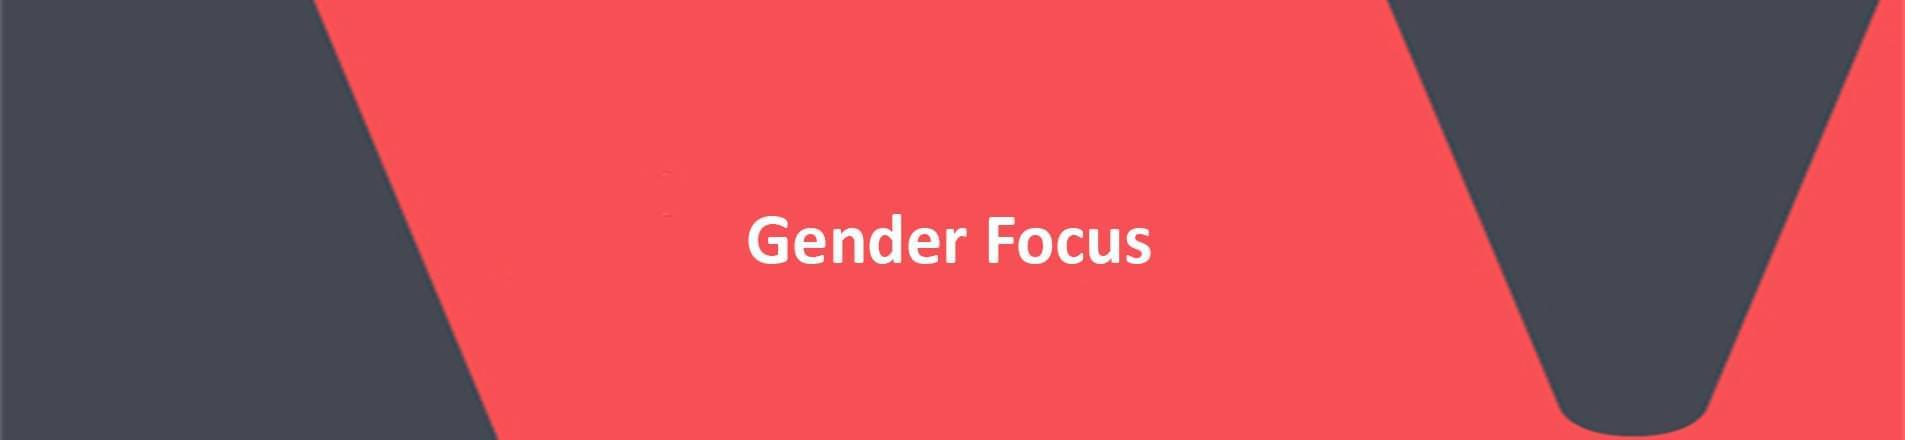 The words gender focus on a red VERCIDA branded background